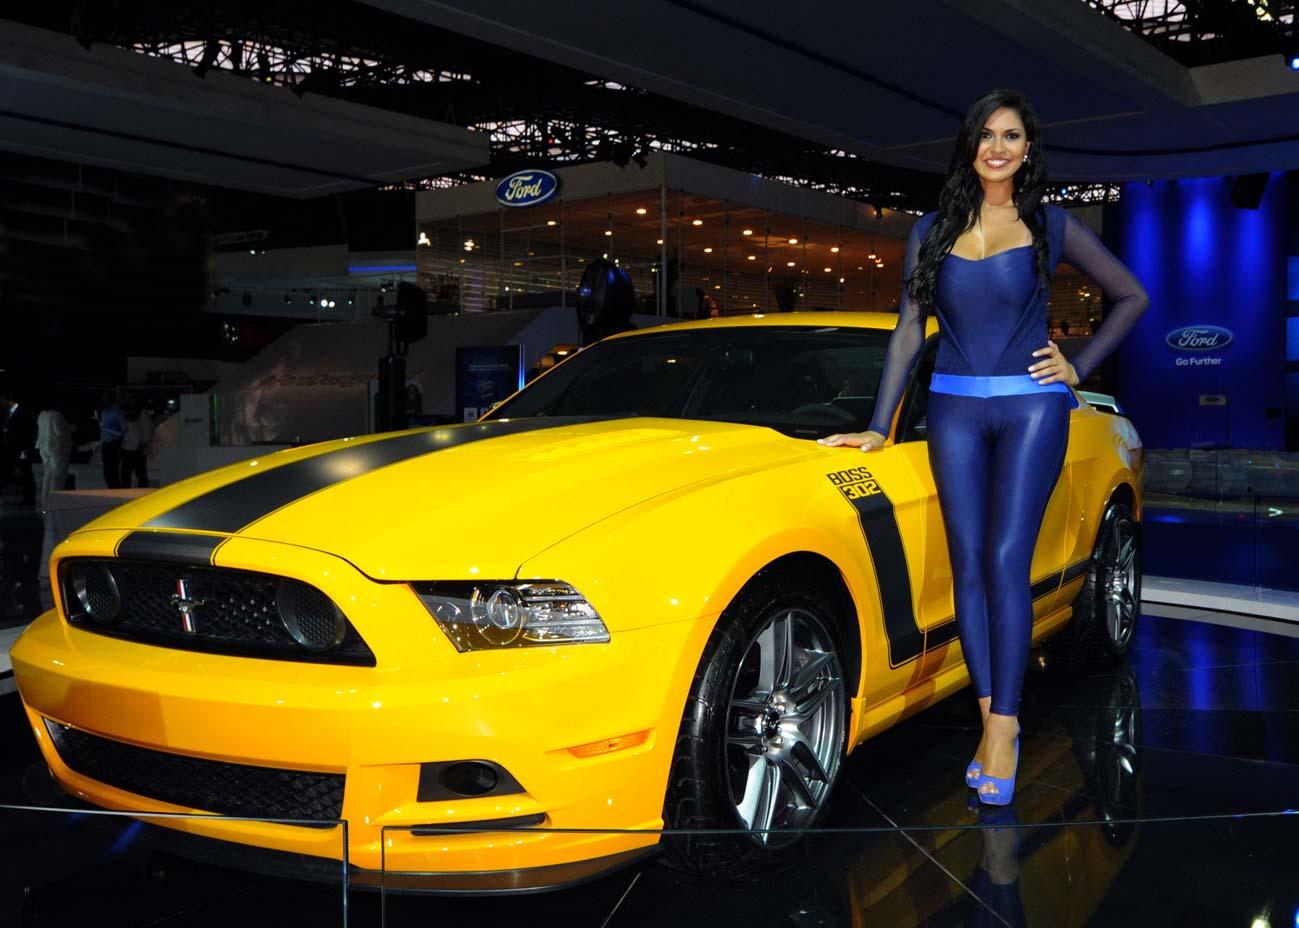 S P E E D C A L Ford Mustang E Garota Mustang Show De